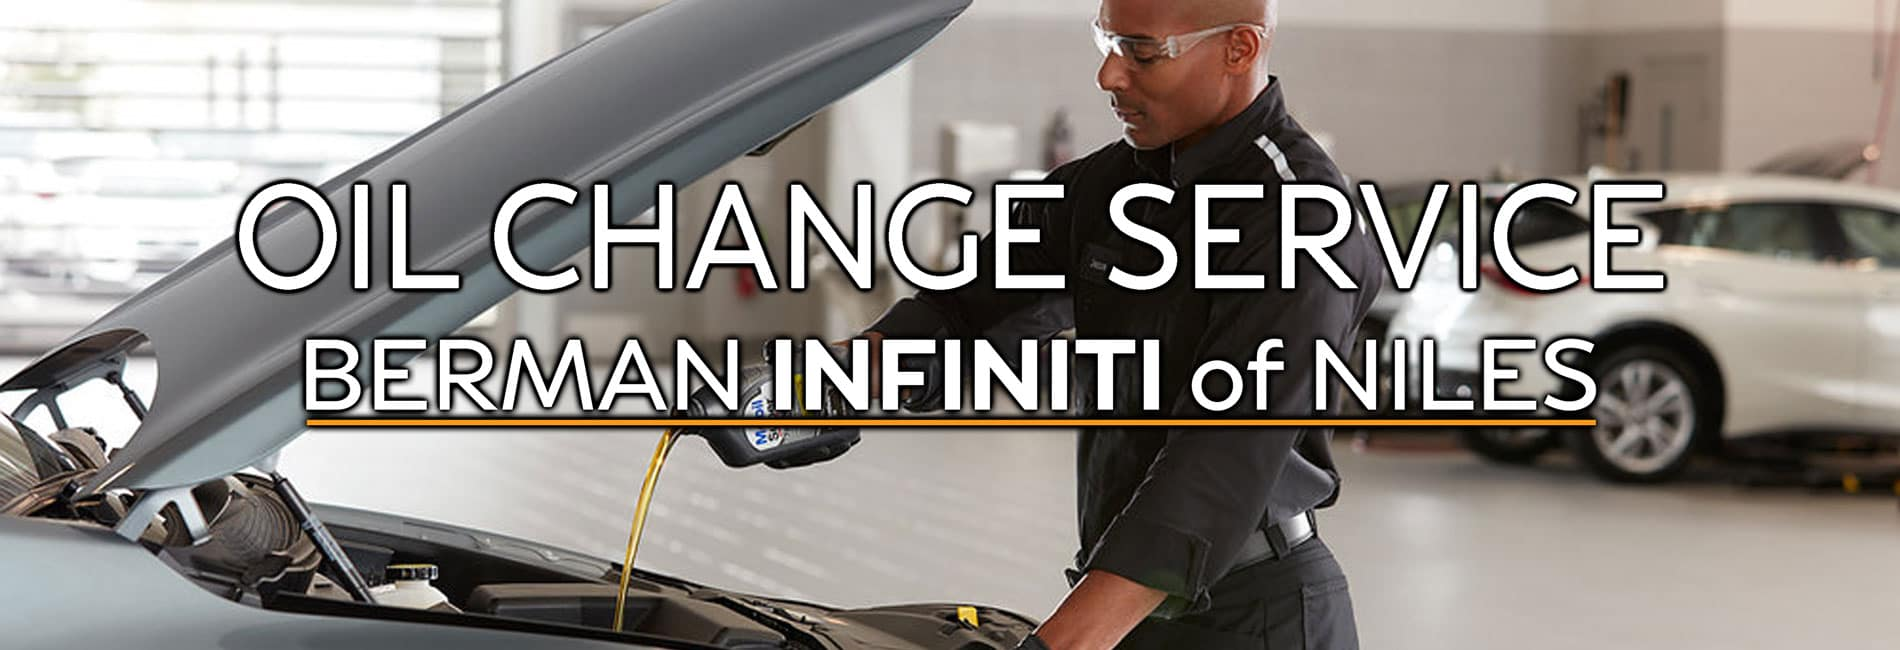 Niles INFINITI Oil Change